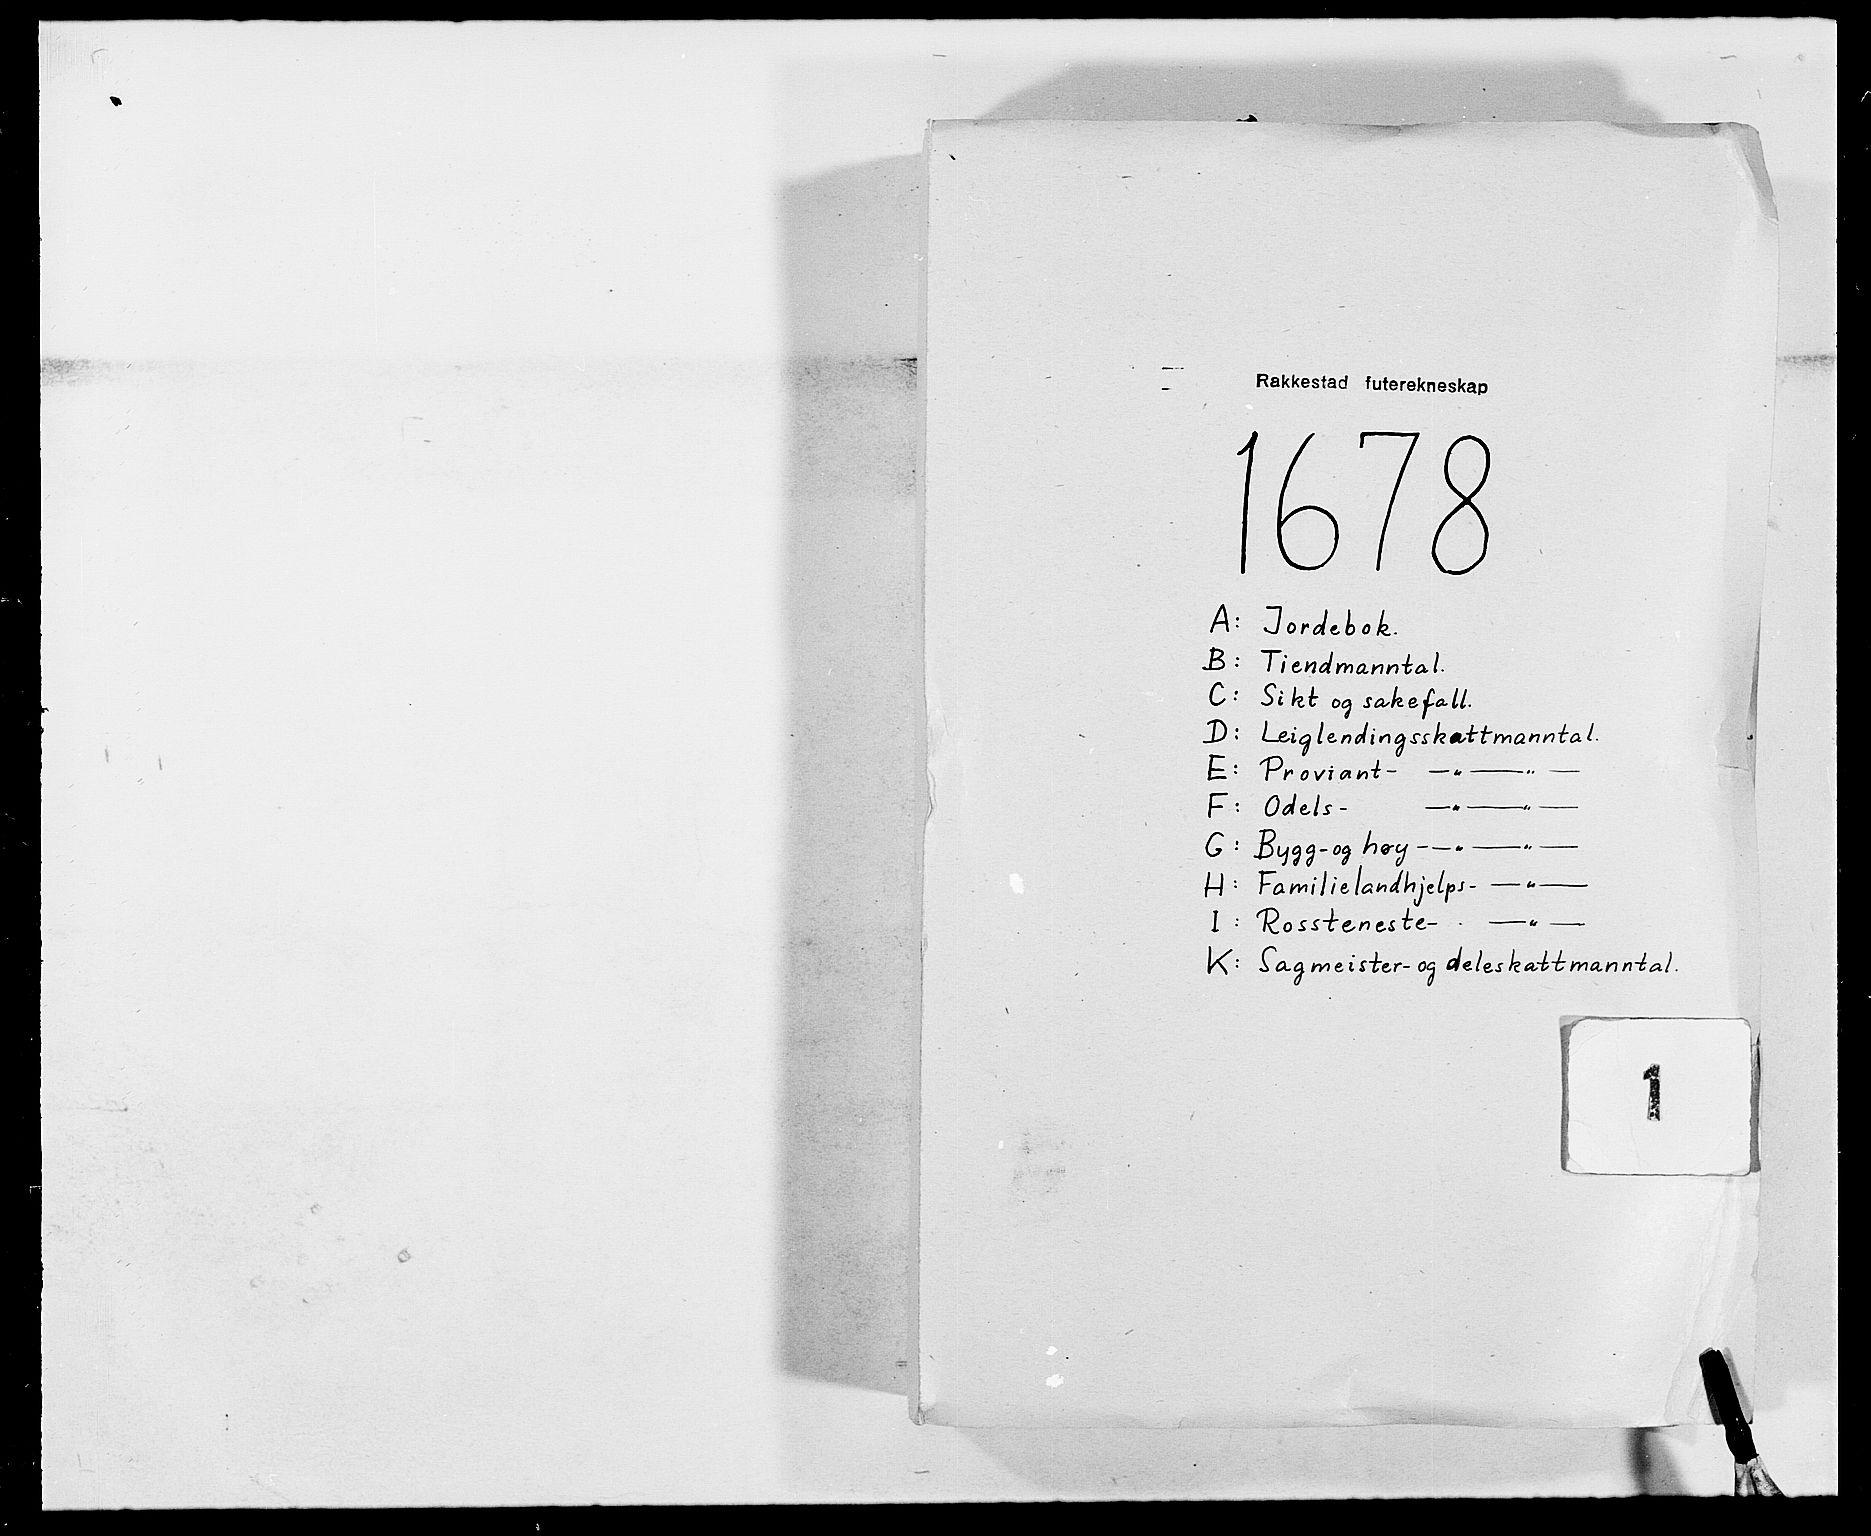 RA, Rentekammeret inntil 1814, Reviderte regnskaper, Fogderegnskap, R05/L0271: Fogderegnskap Rakkestad, 1678-1679, s. 1